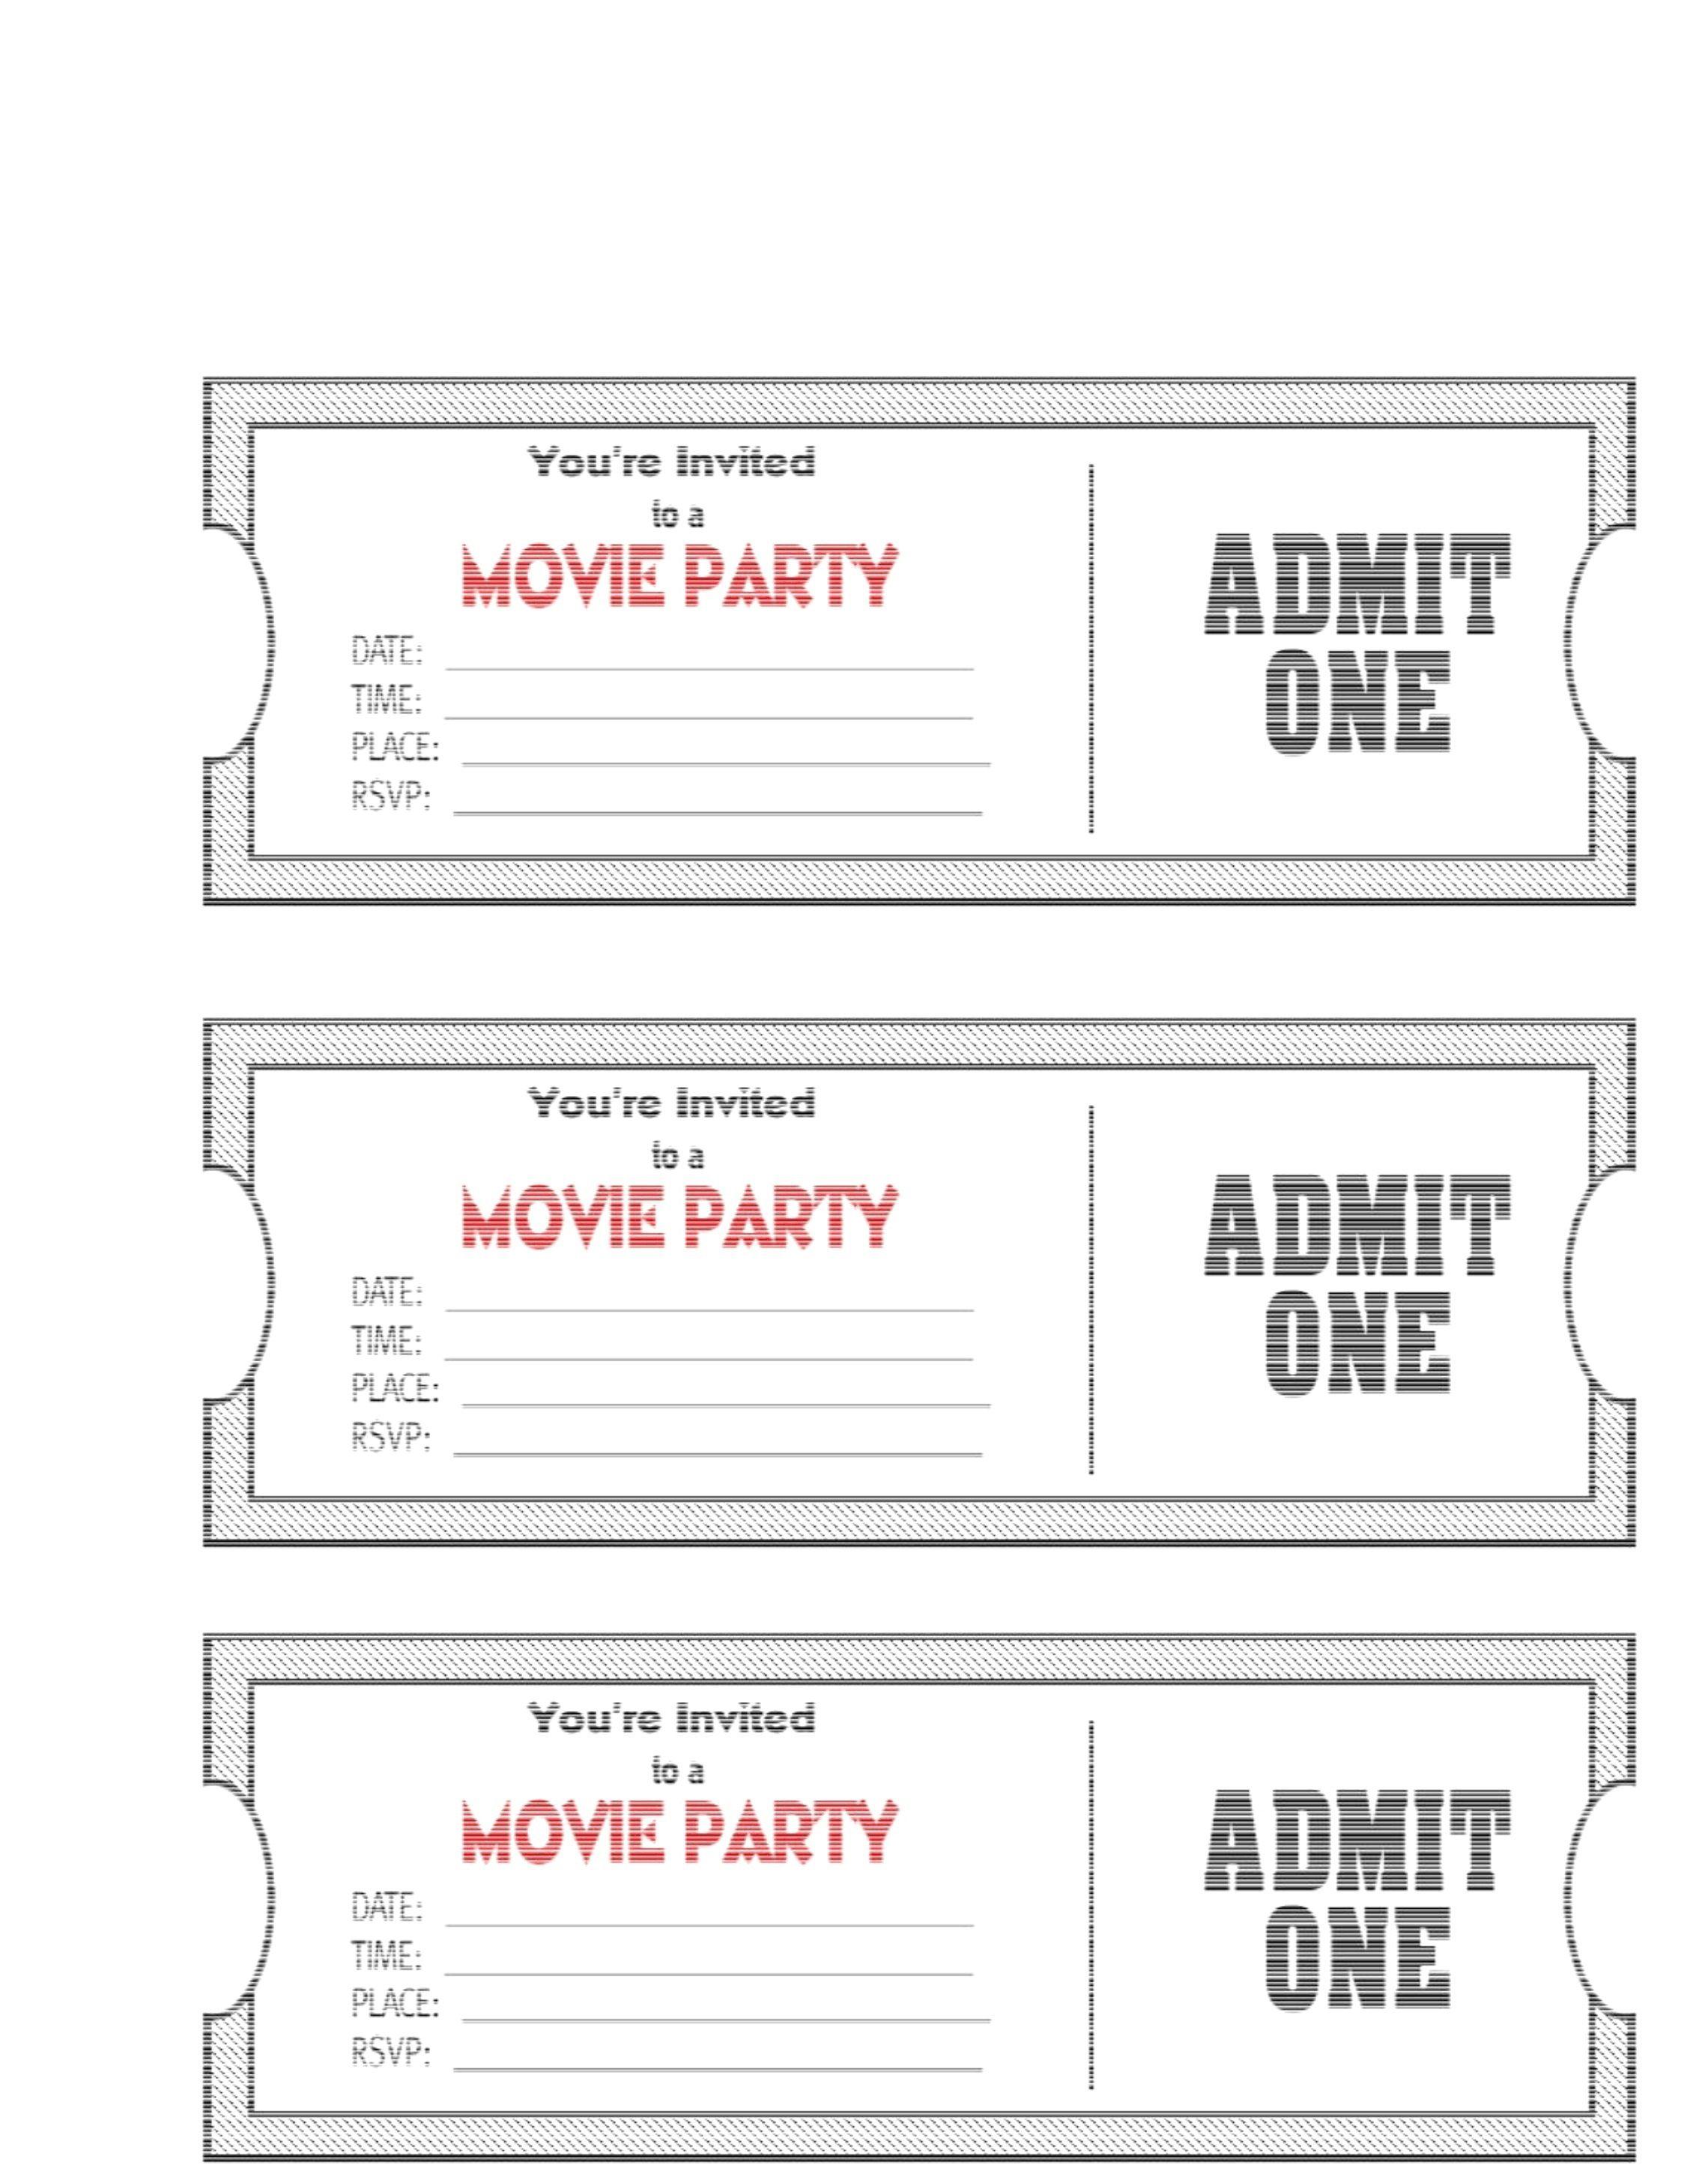 002 Sensational Free Printable Ticket Template High Def  Editable Airline Christma For GiftFull